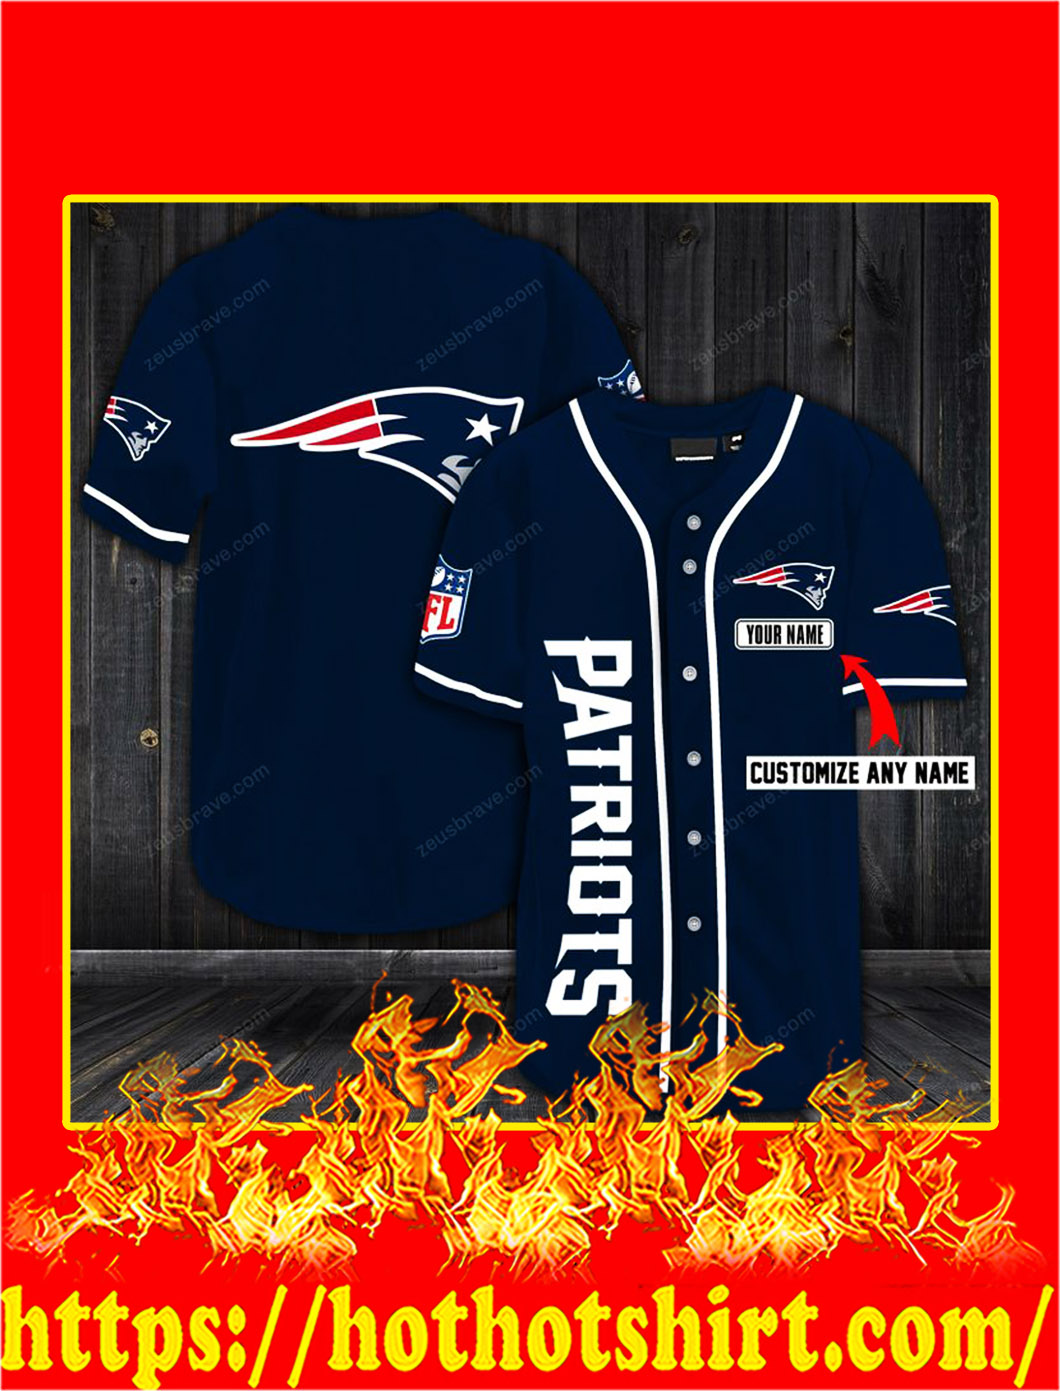 Customize name new england patriots hawaiian shirt- navy